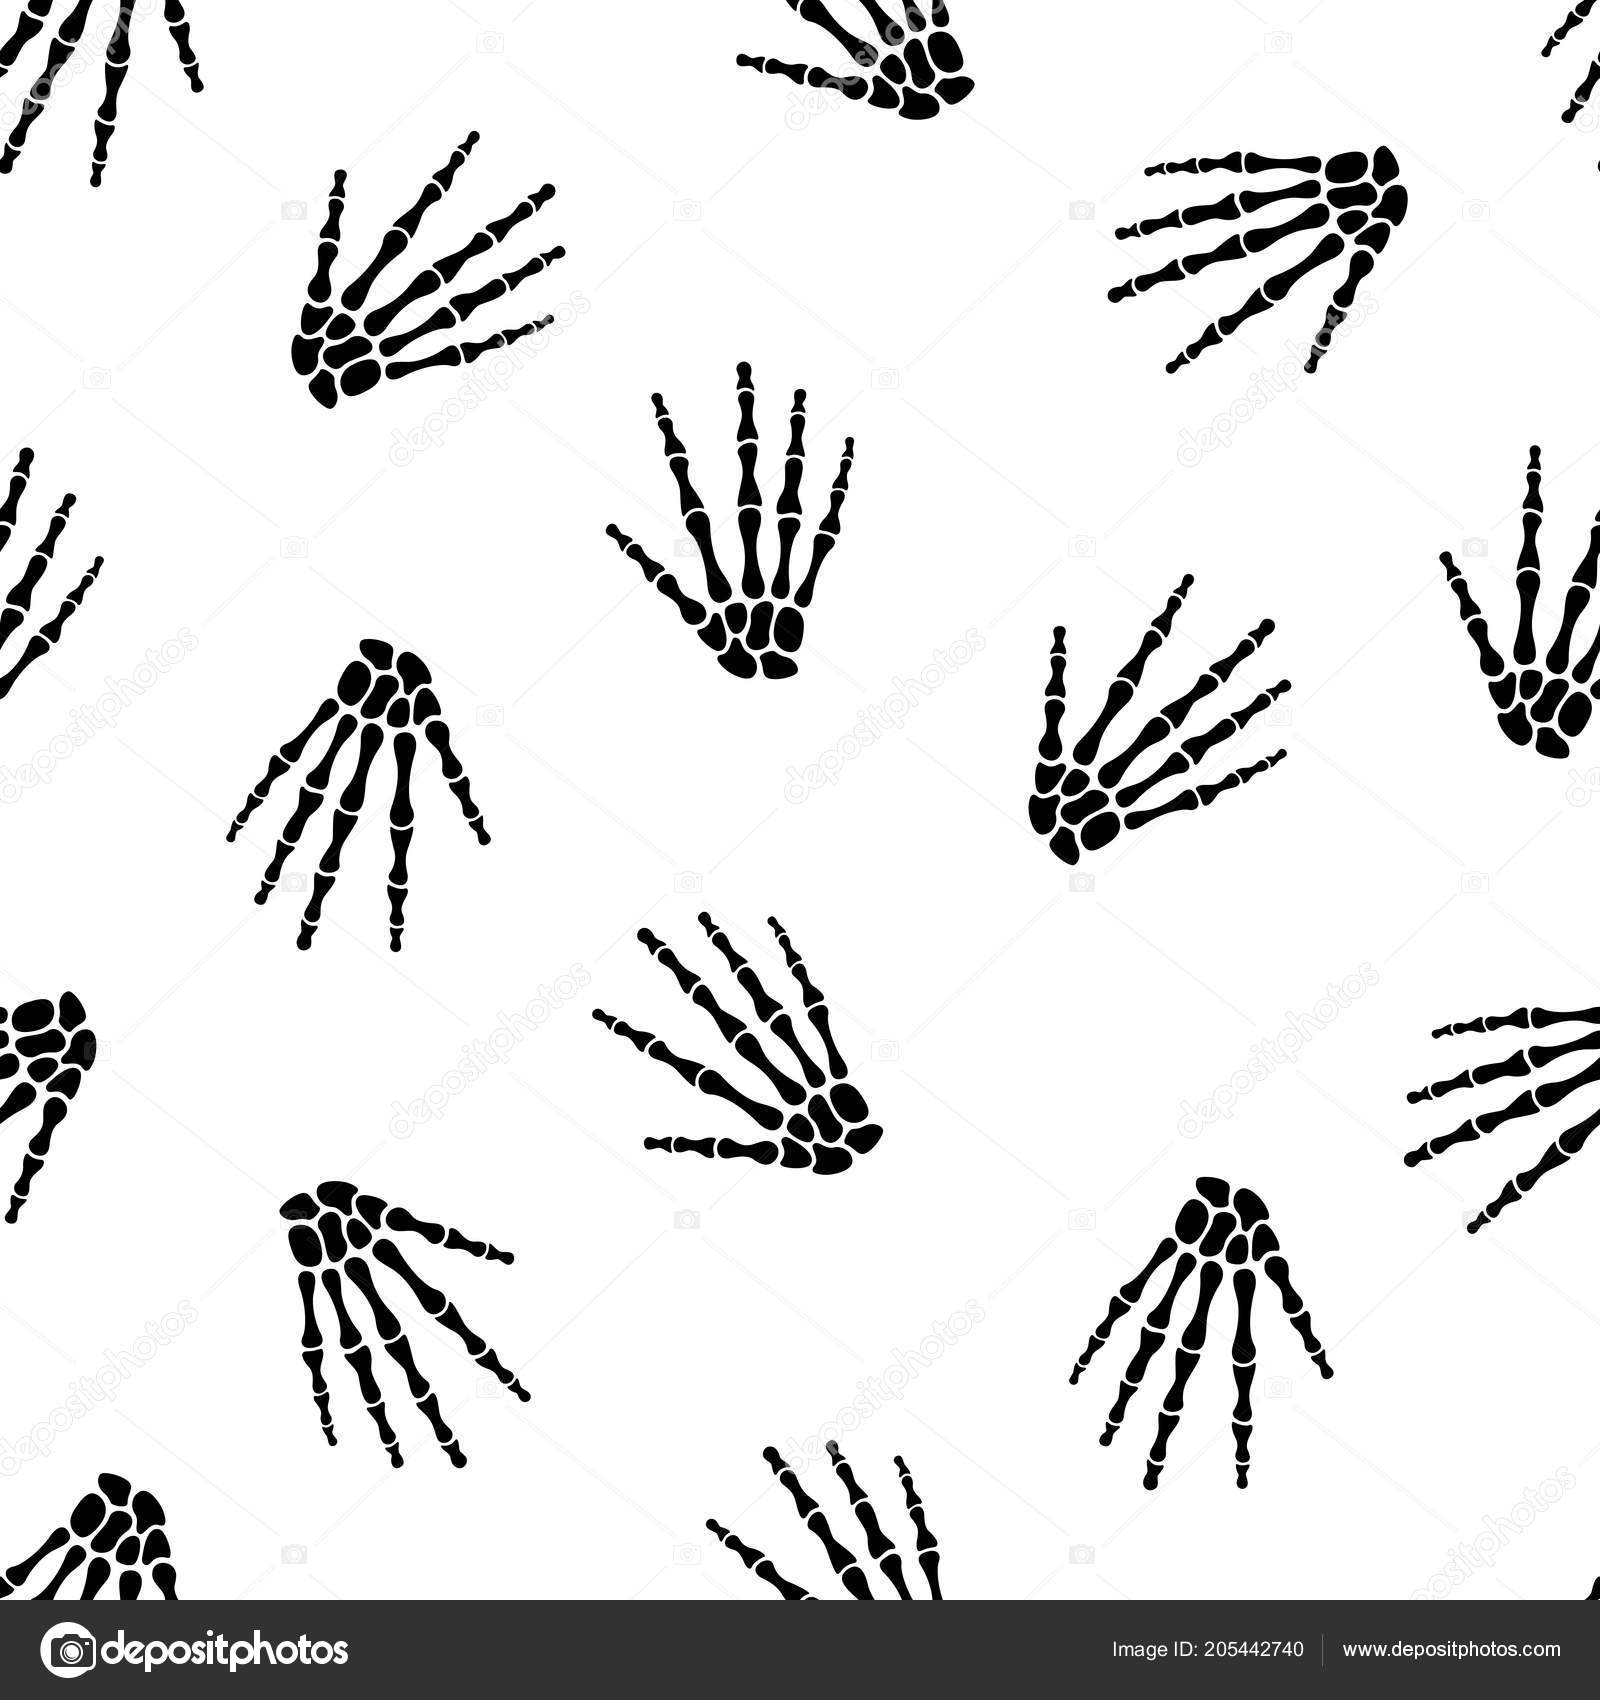 Vector Illustration Seamless Pattern Human Skeleton Hand Stock